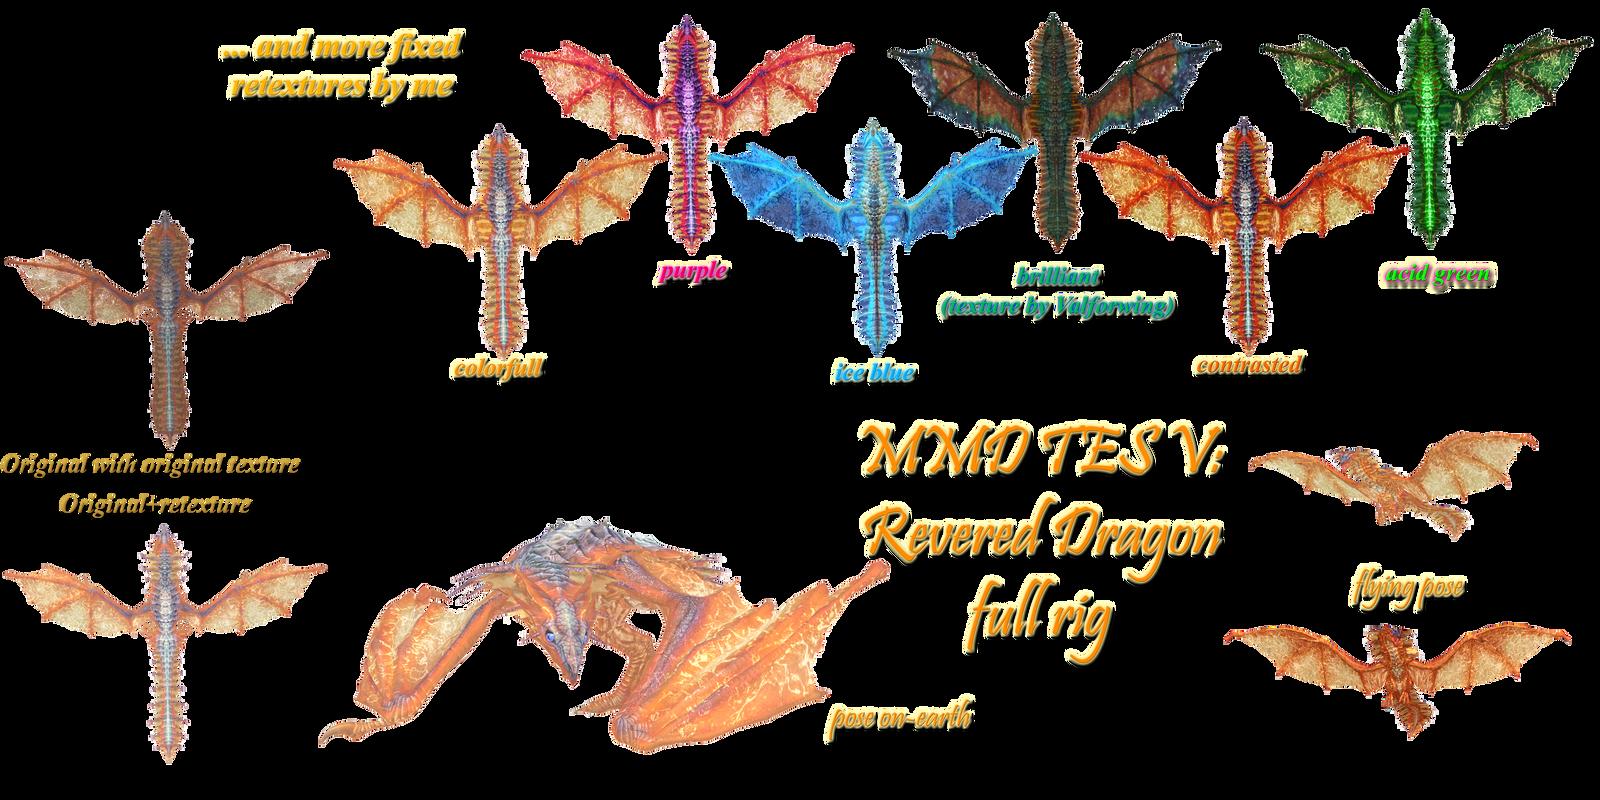 MMD TES V: Revered dragon download by Tokami-Fuko on DeviantArt